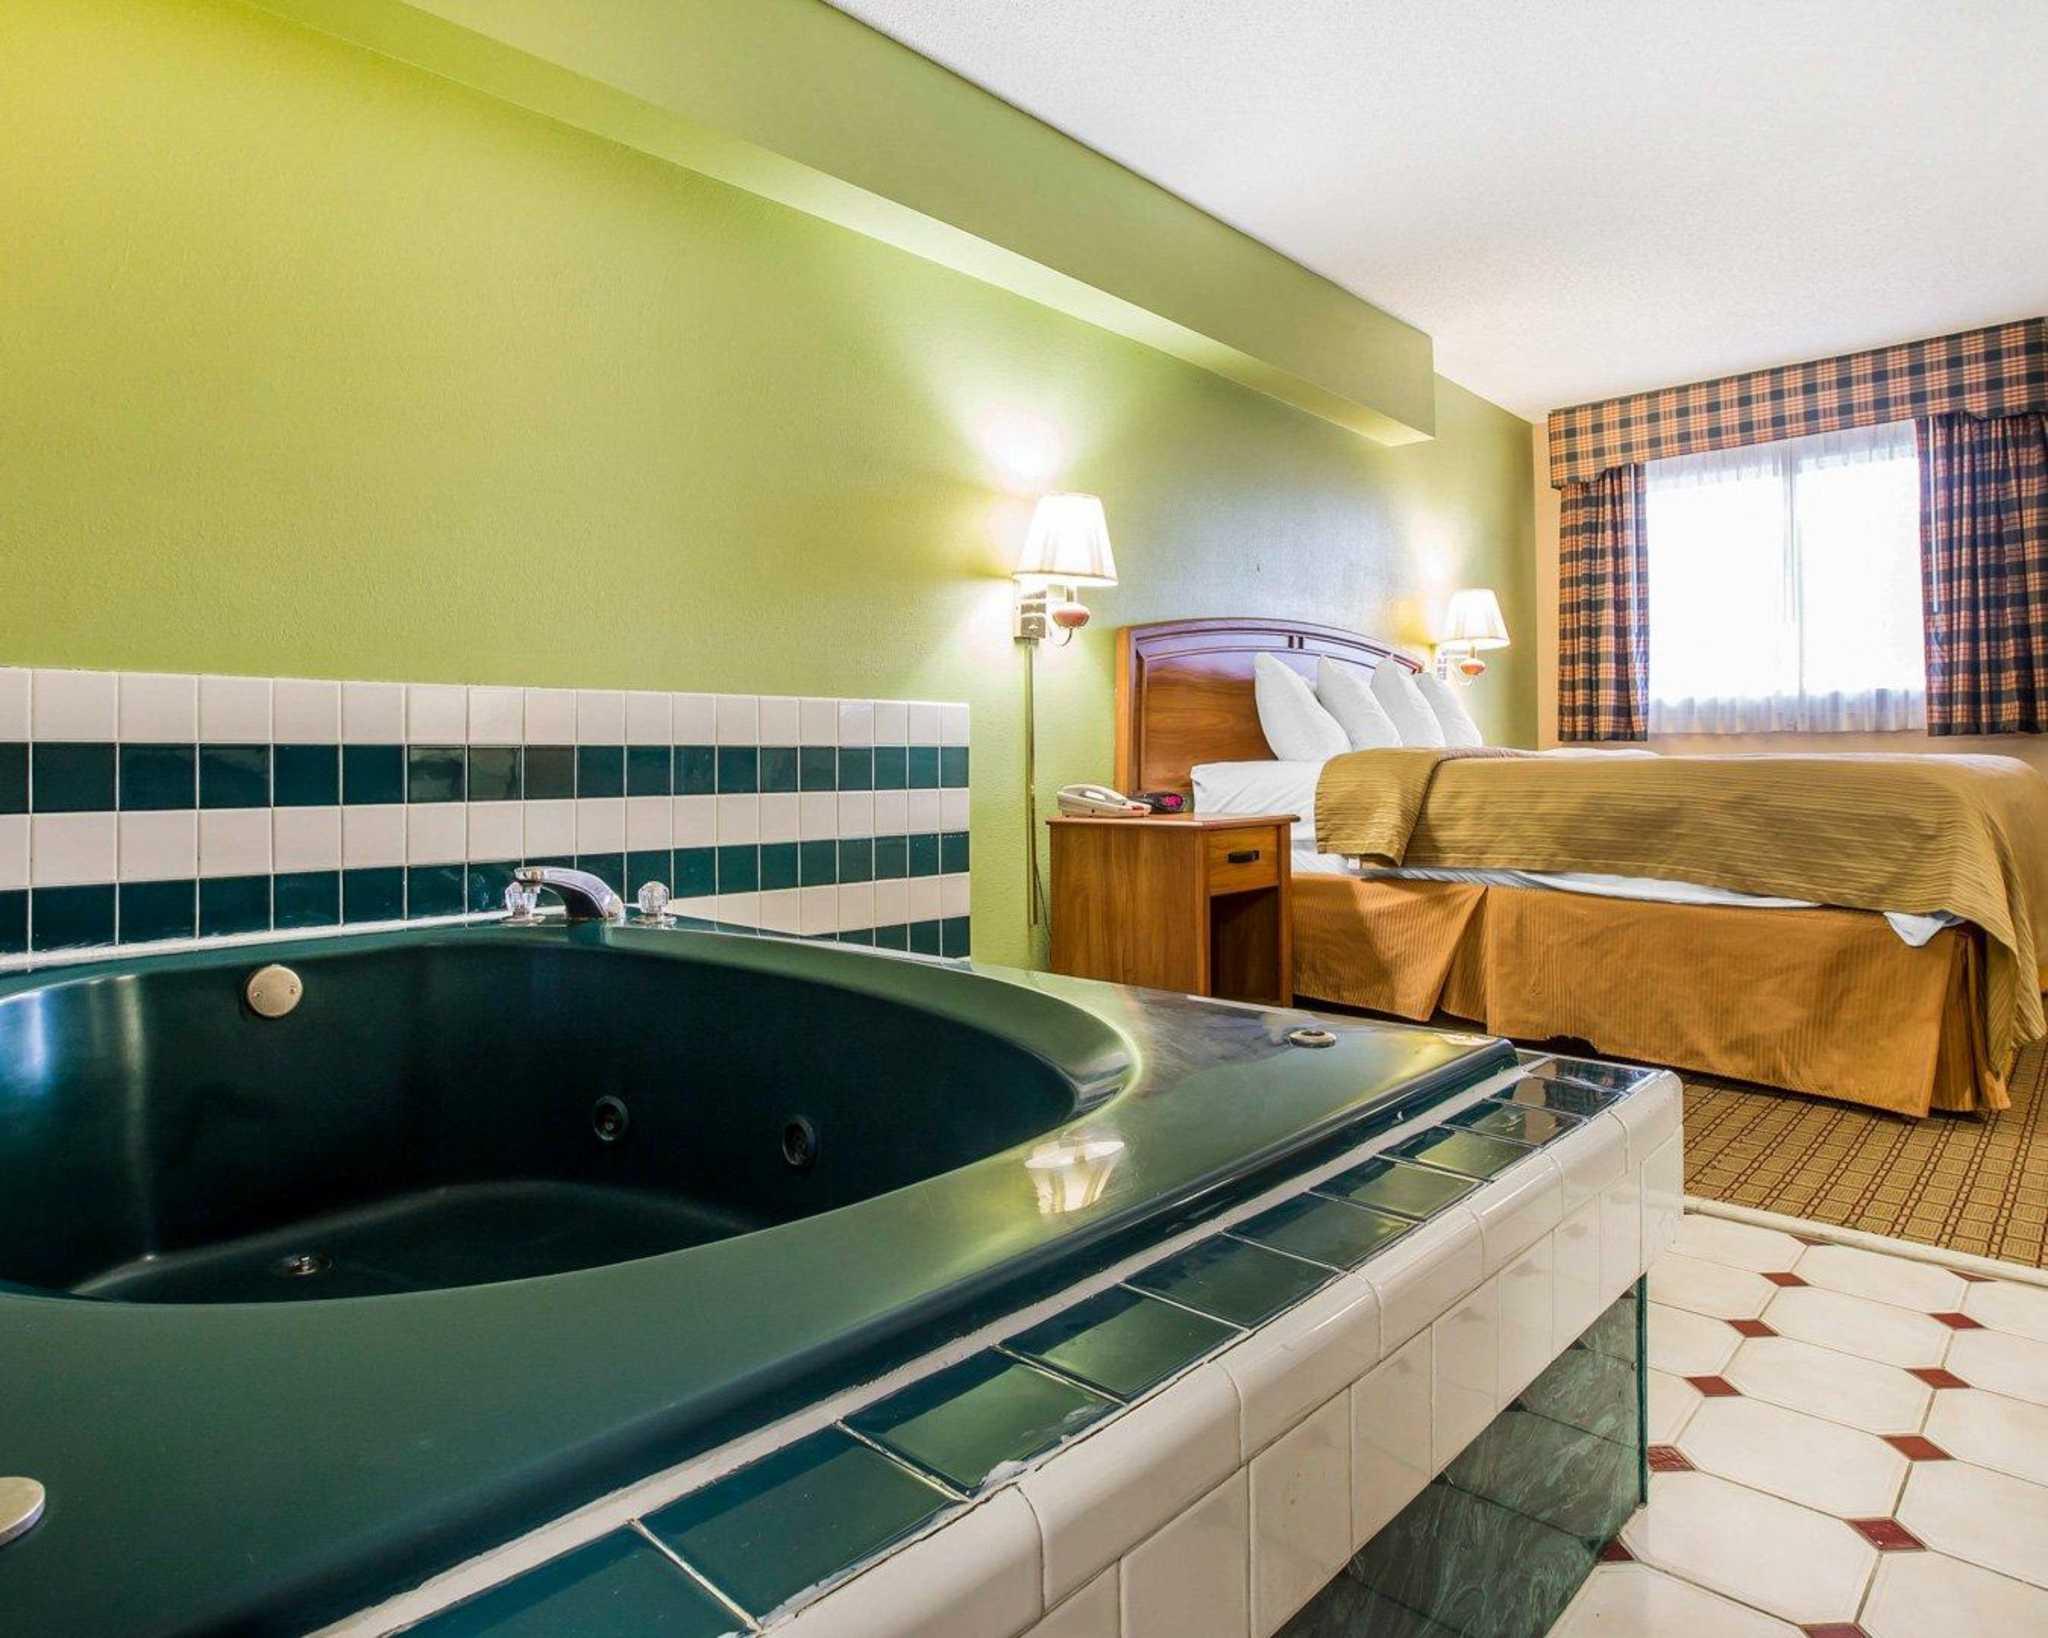 Quality Inn & Suites Dublin image 7